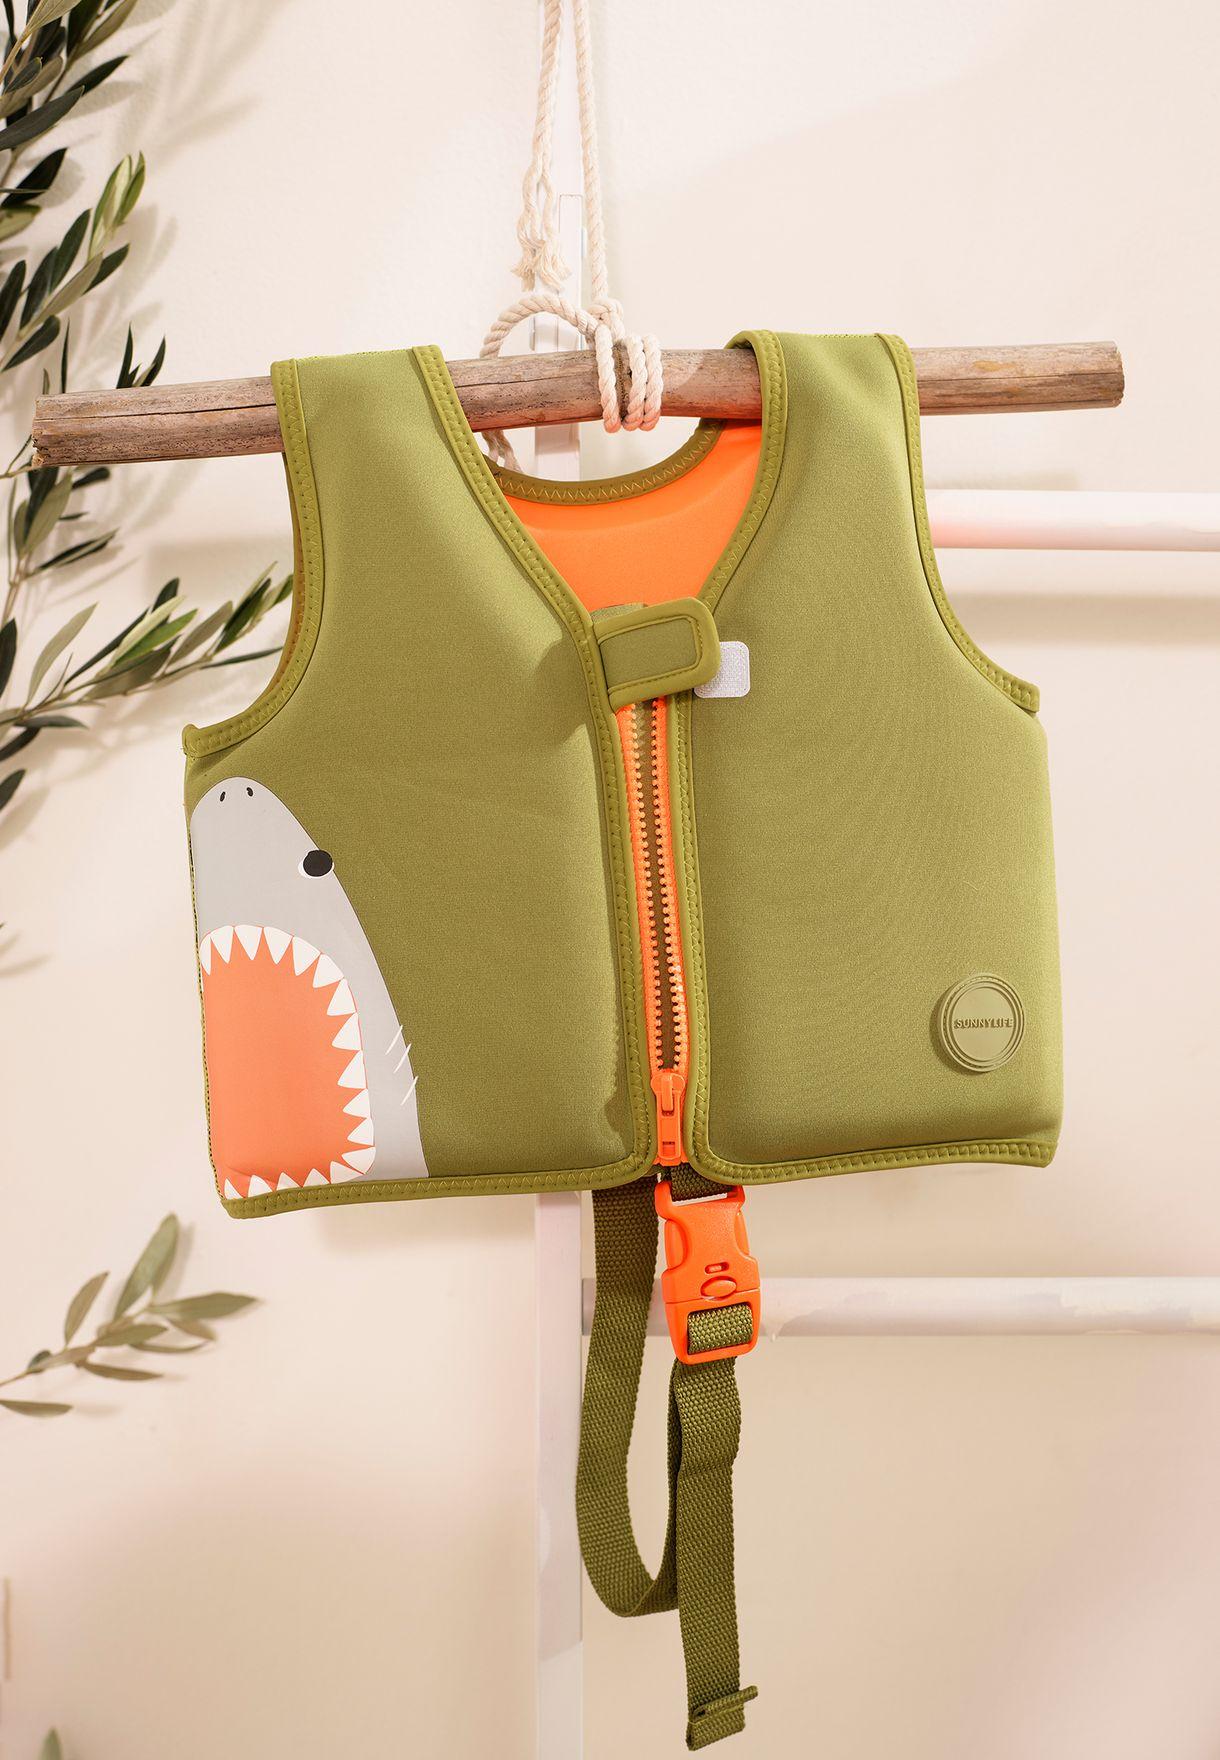 Shark Attack Lifesaver Vest